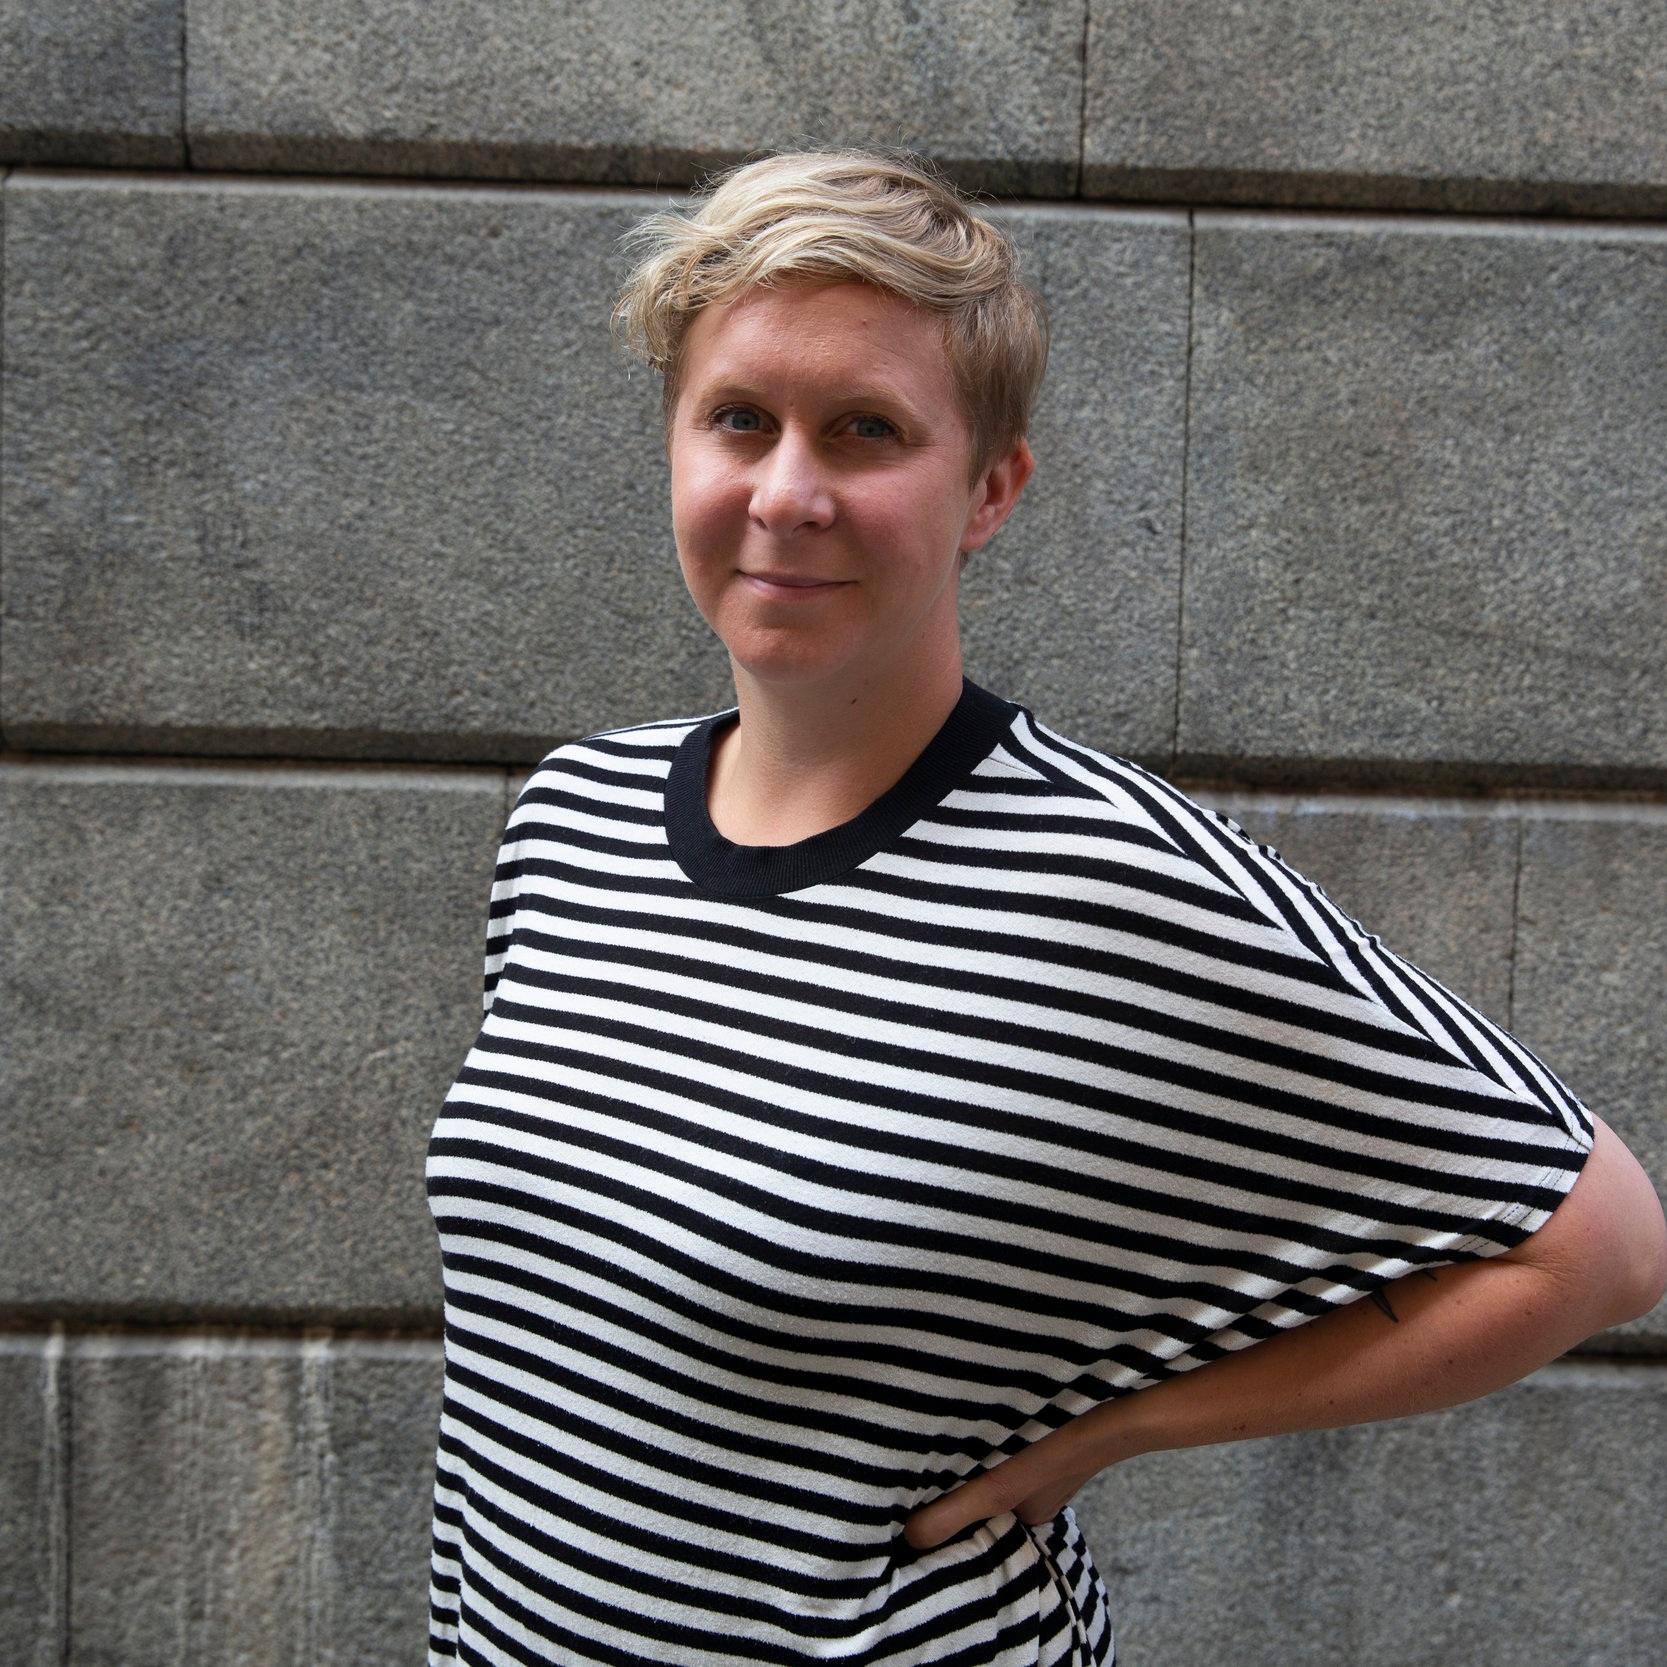 FRIDA WALLMAN - PRODUCER / ASSOCIATE PRODUCER